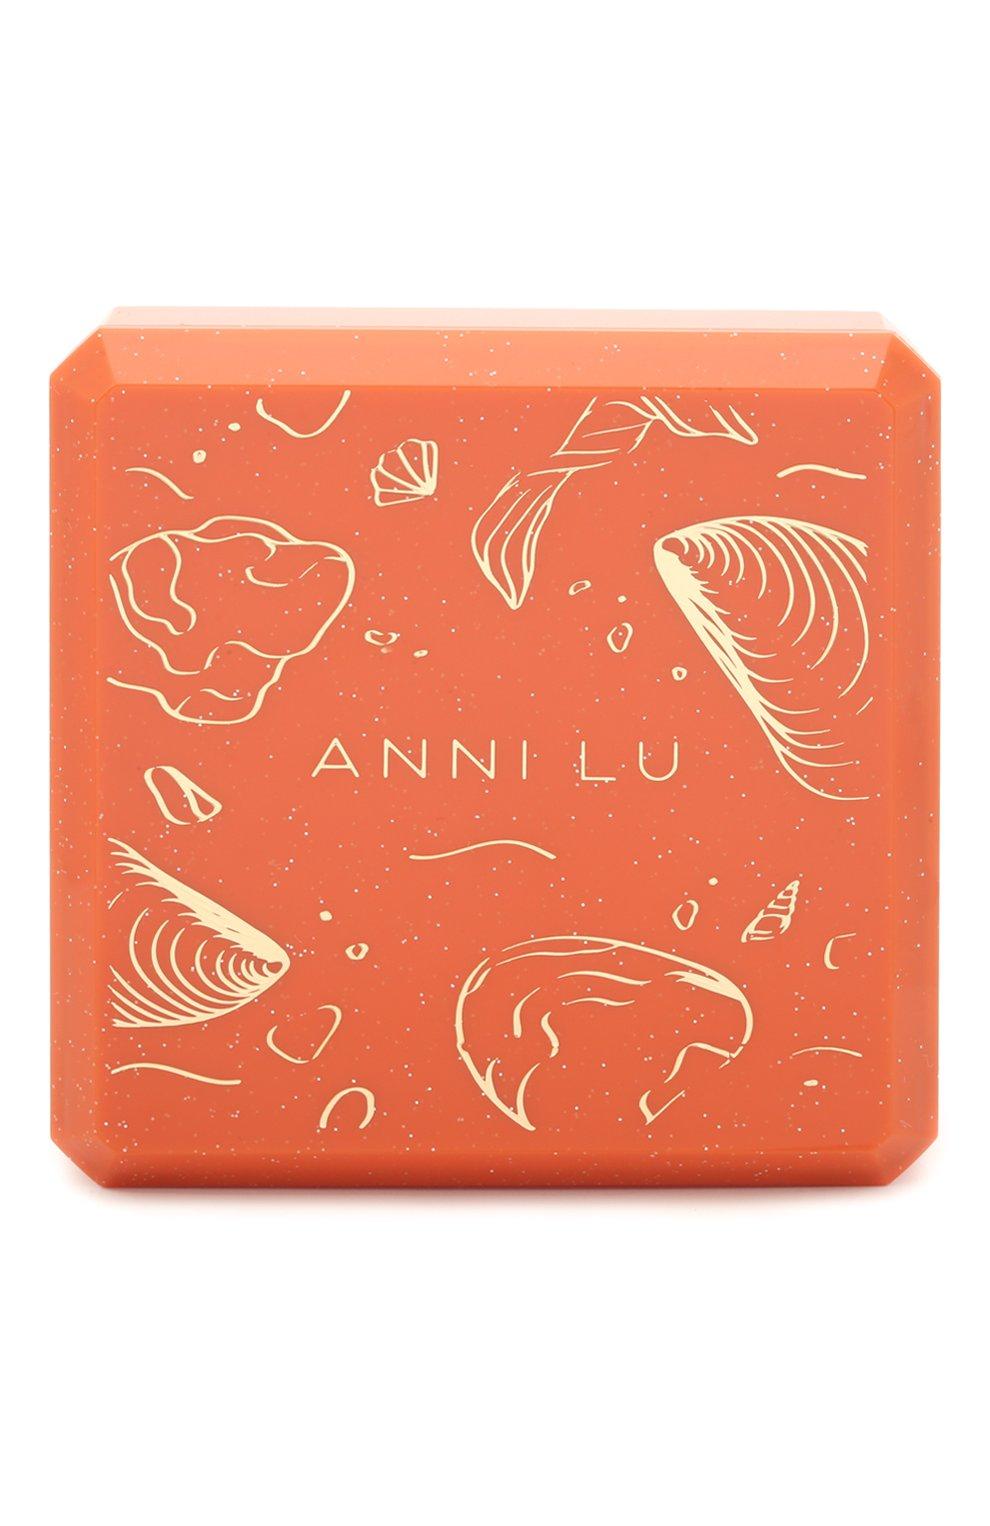 Женский браслет hanalei ANNI LU золотого цвета, арт. 191-10-04 | Фото 3 (Материал: Стекло, Металл)